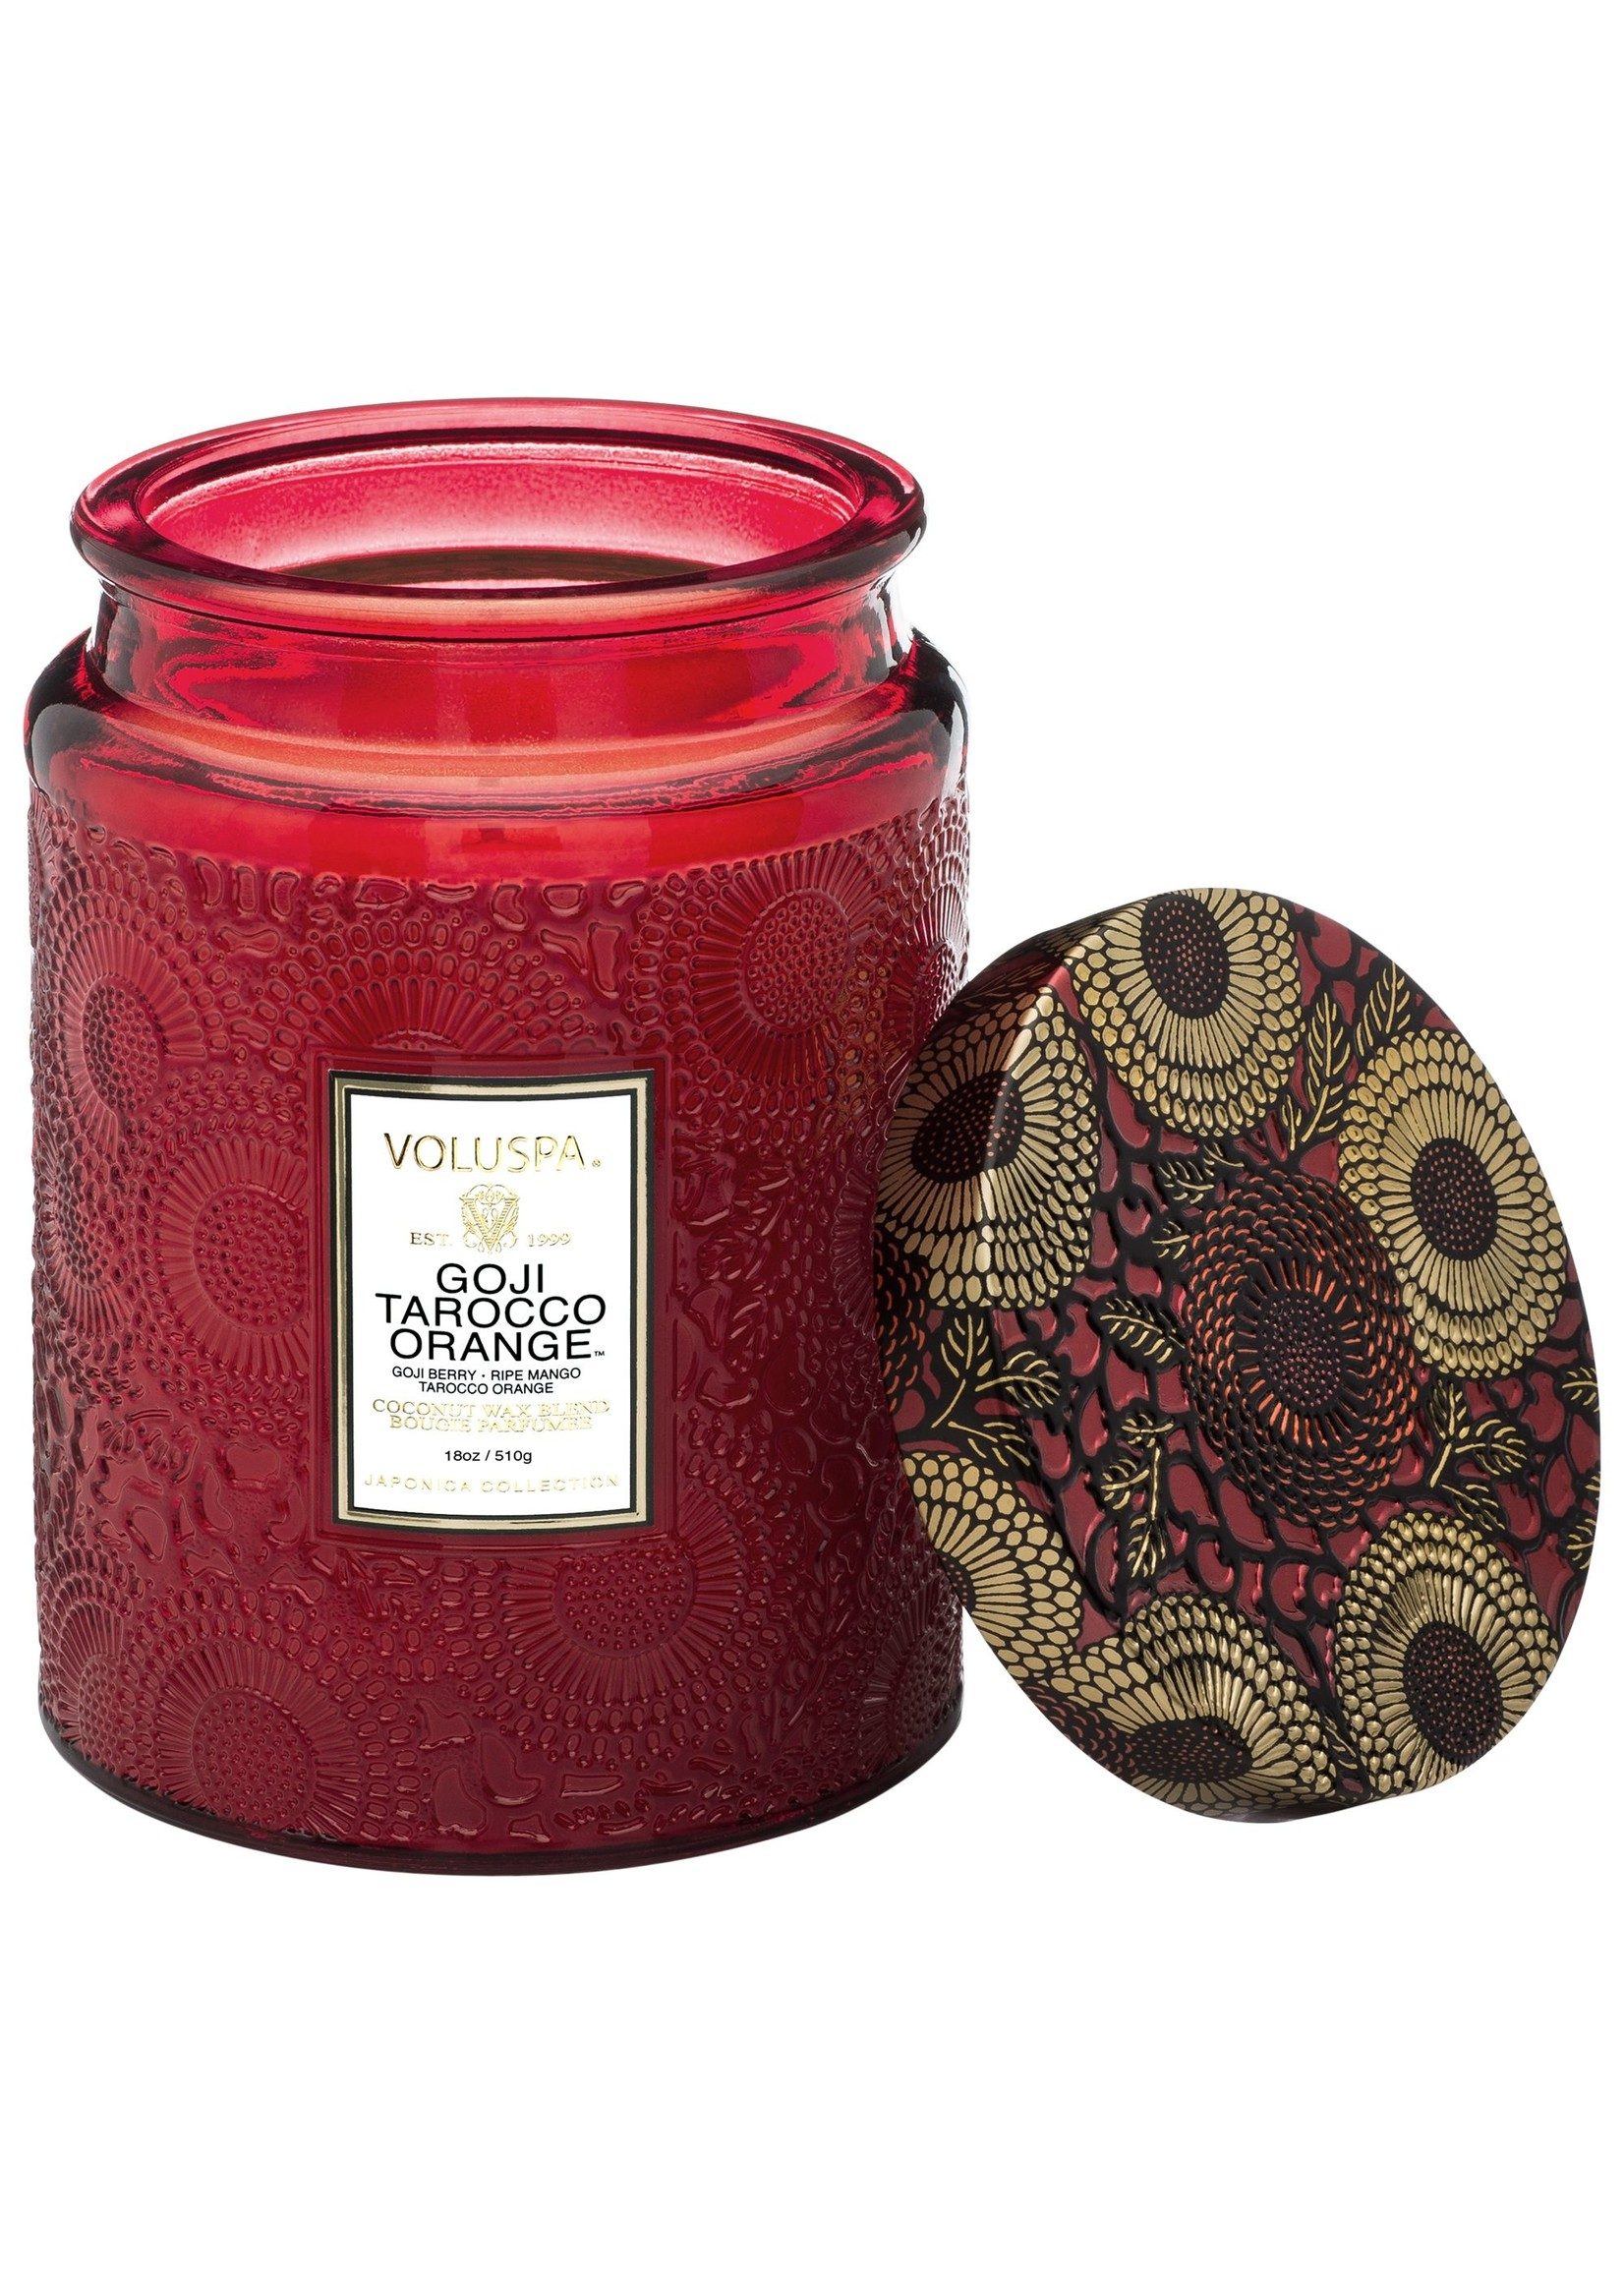 Voluspa Goji & Tarocco Orange Large Jar Candle